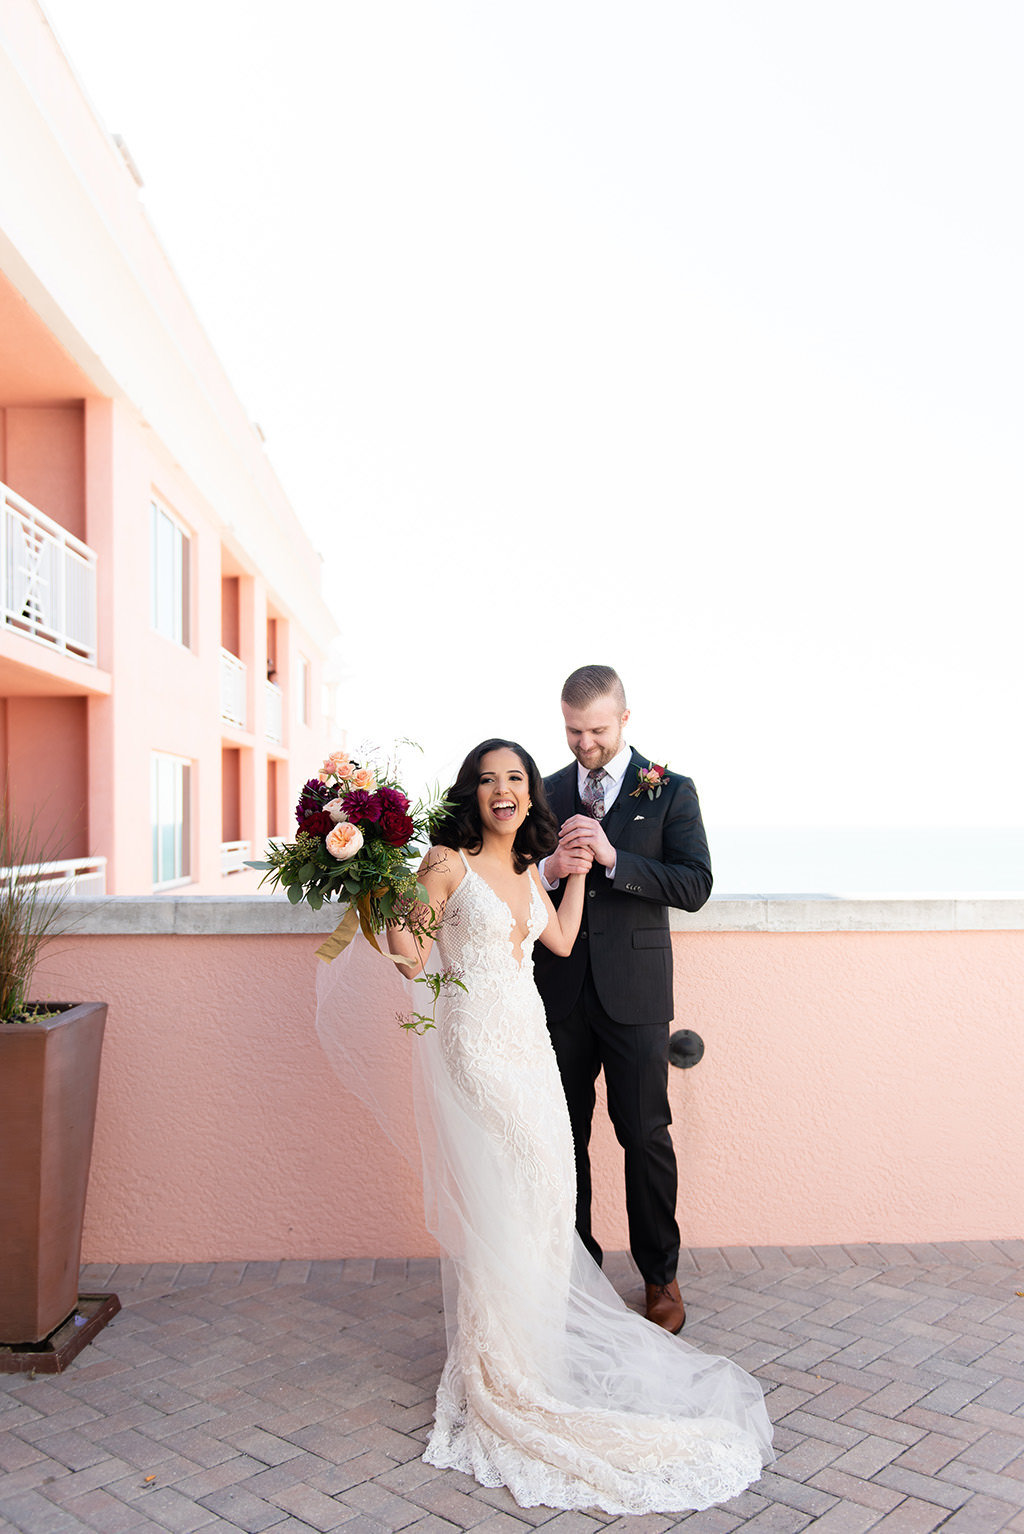 Florida Bride and Groom First Look Wedding Portrait on Waterfront Rooftop Hotel Wedding Venue Hyatt Regency Clearwater Beach | Tampa Bay Wedding Dress Shop Isabel O'Neil Bridal Collection | Galia Lahav Wedding Dress